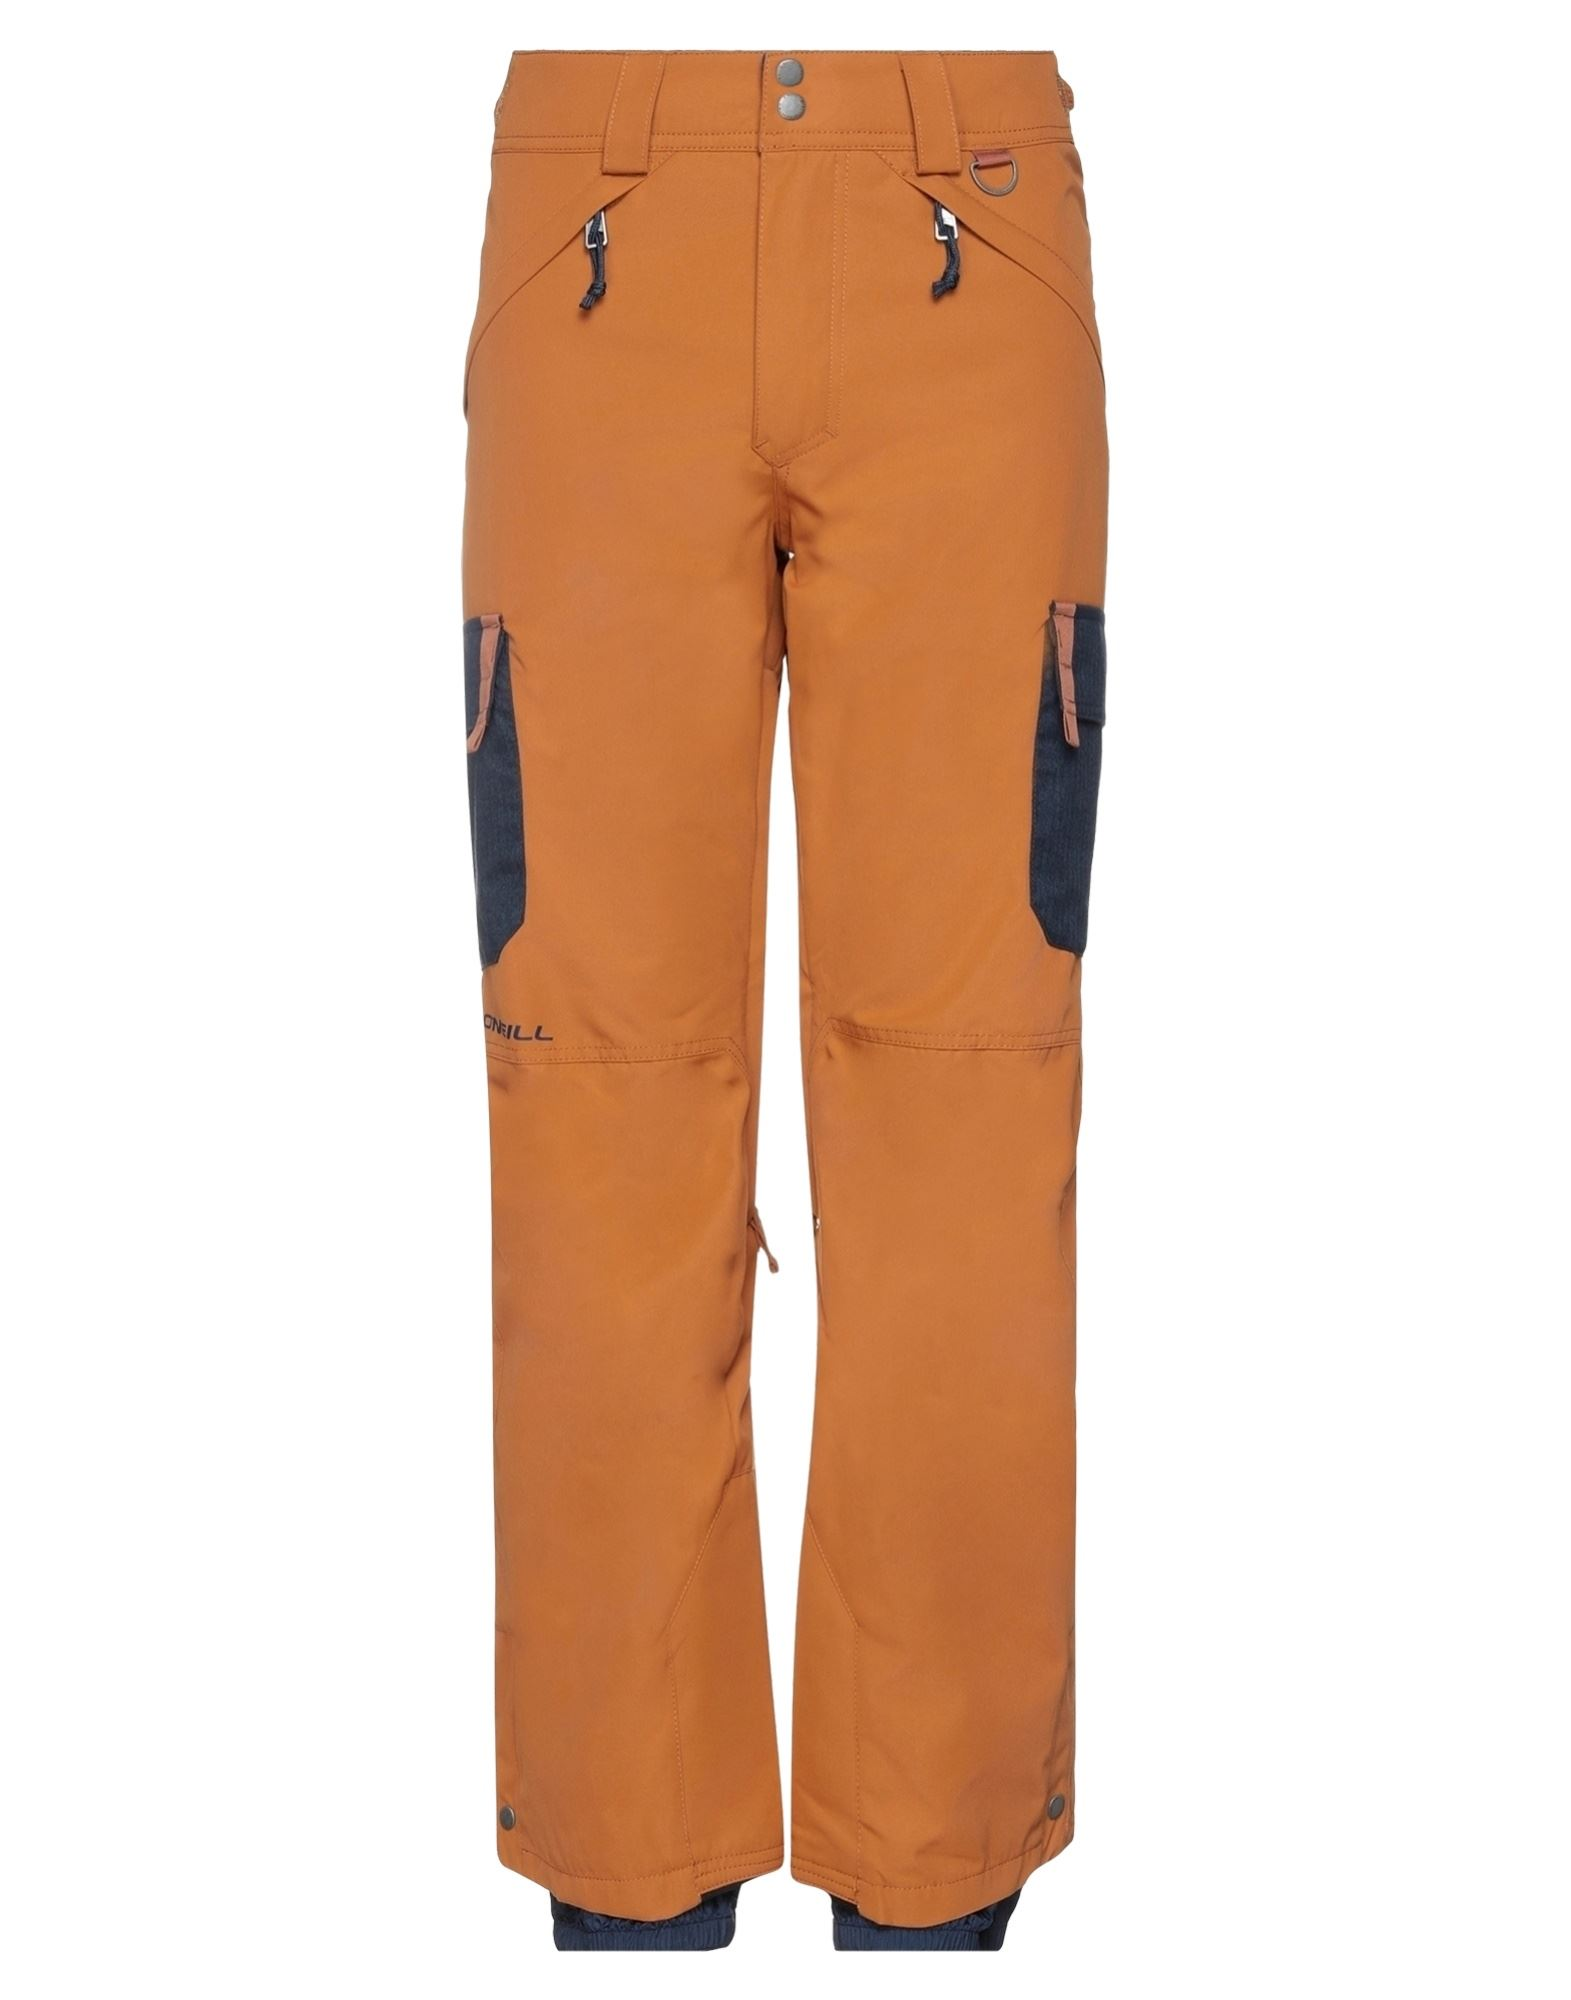 O'NEILL オニール メンズ スキーウェア キャメル - ダークブルー